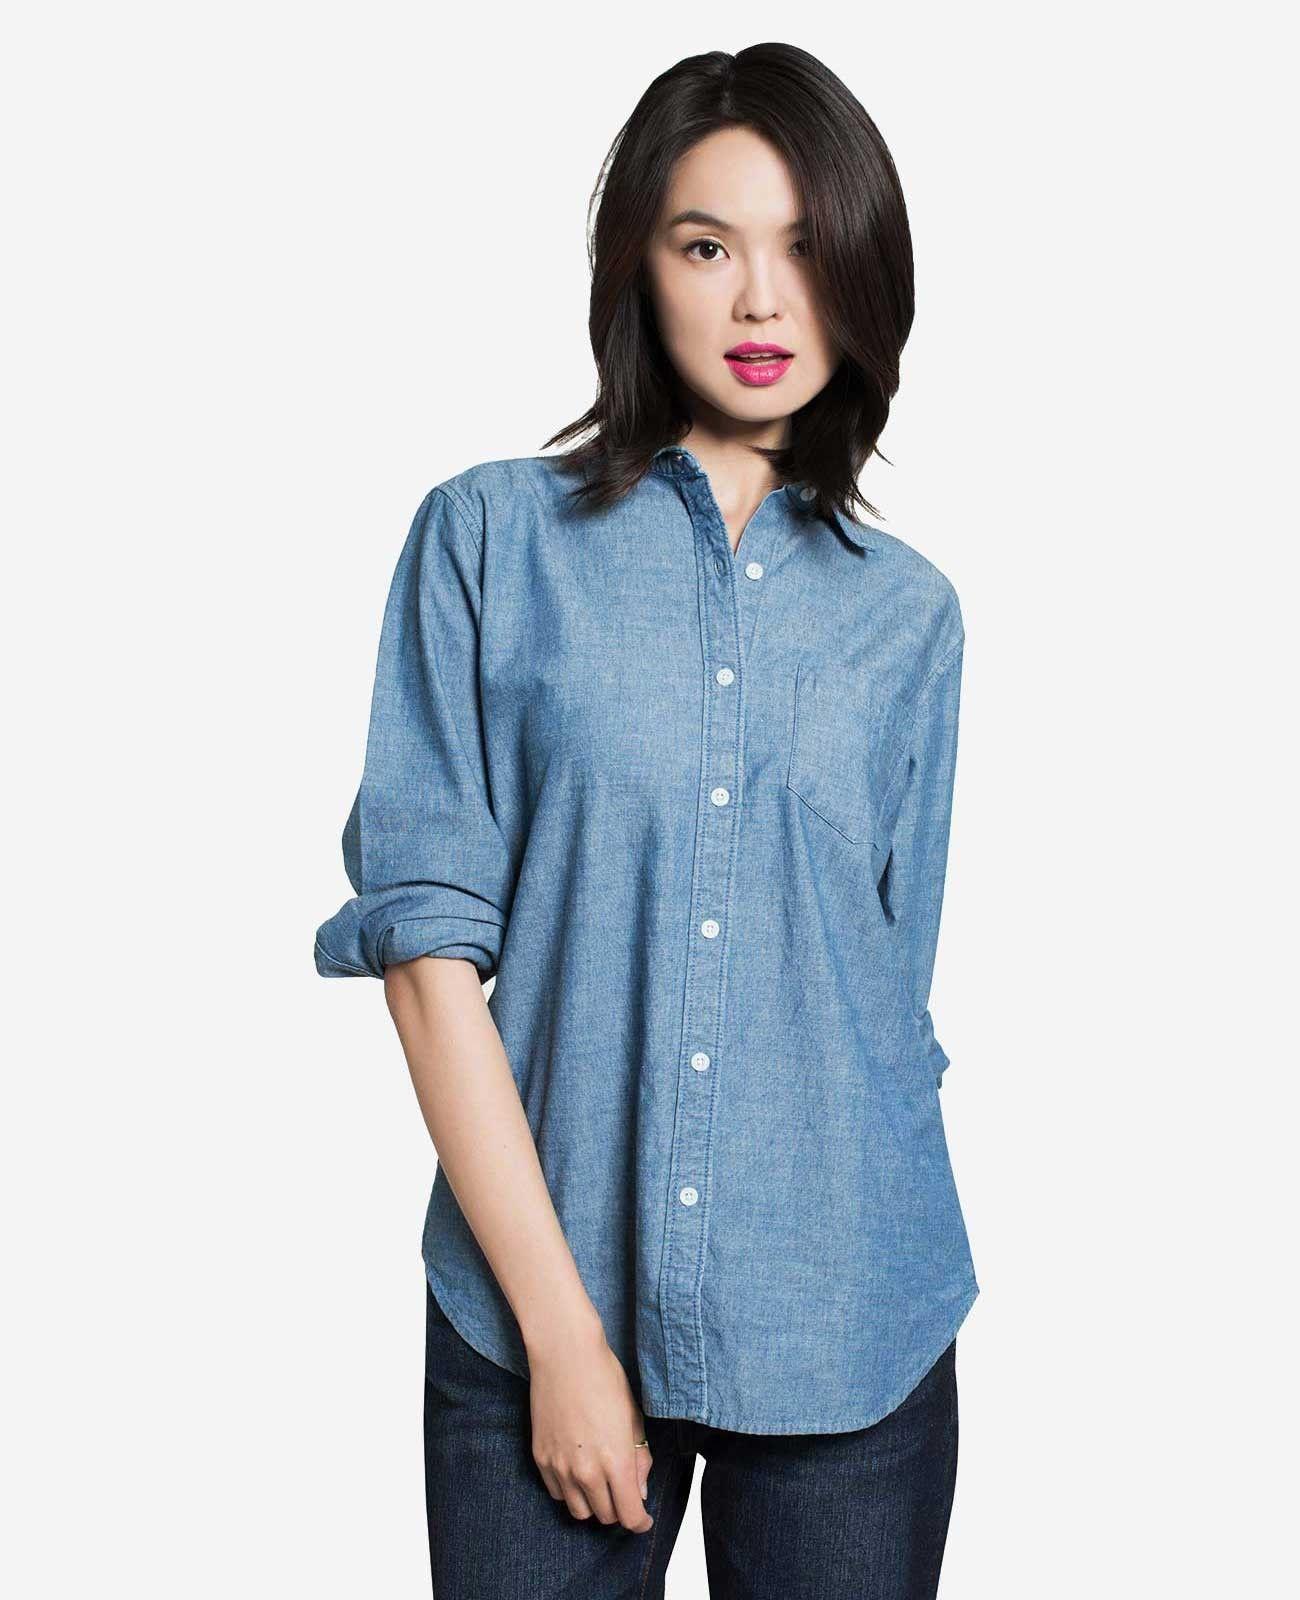 5f12579ba7b Women's Chambray Boyfriend Shirt - Shirts & Blouses - Tops - WOMEN - GRANA:  Wardrobe essentials made from the world's best fabrics